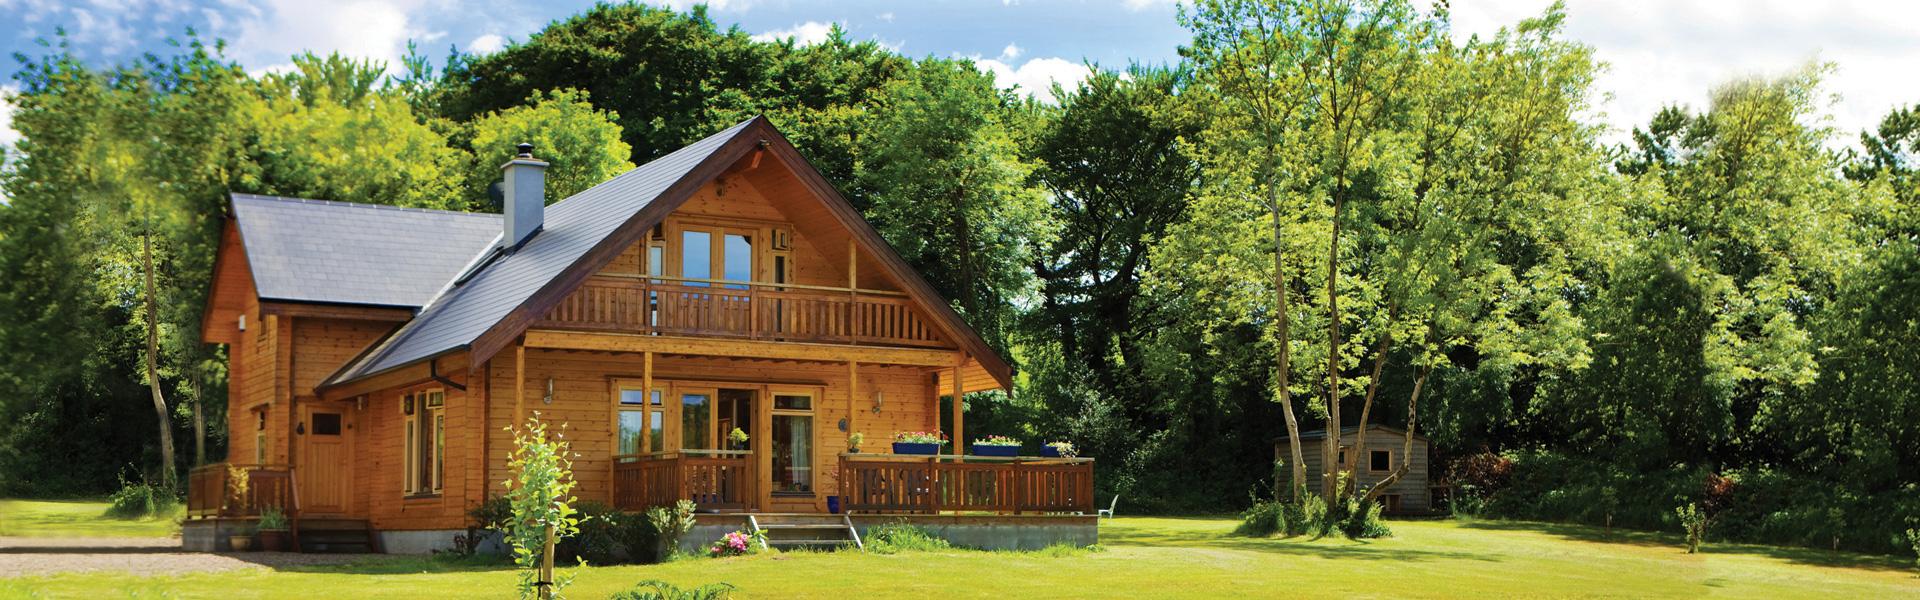 Timber Frame Houses - Self Build Log House - Borg Timber House